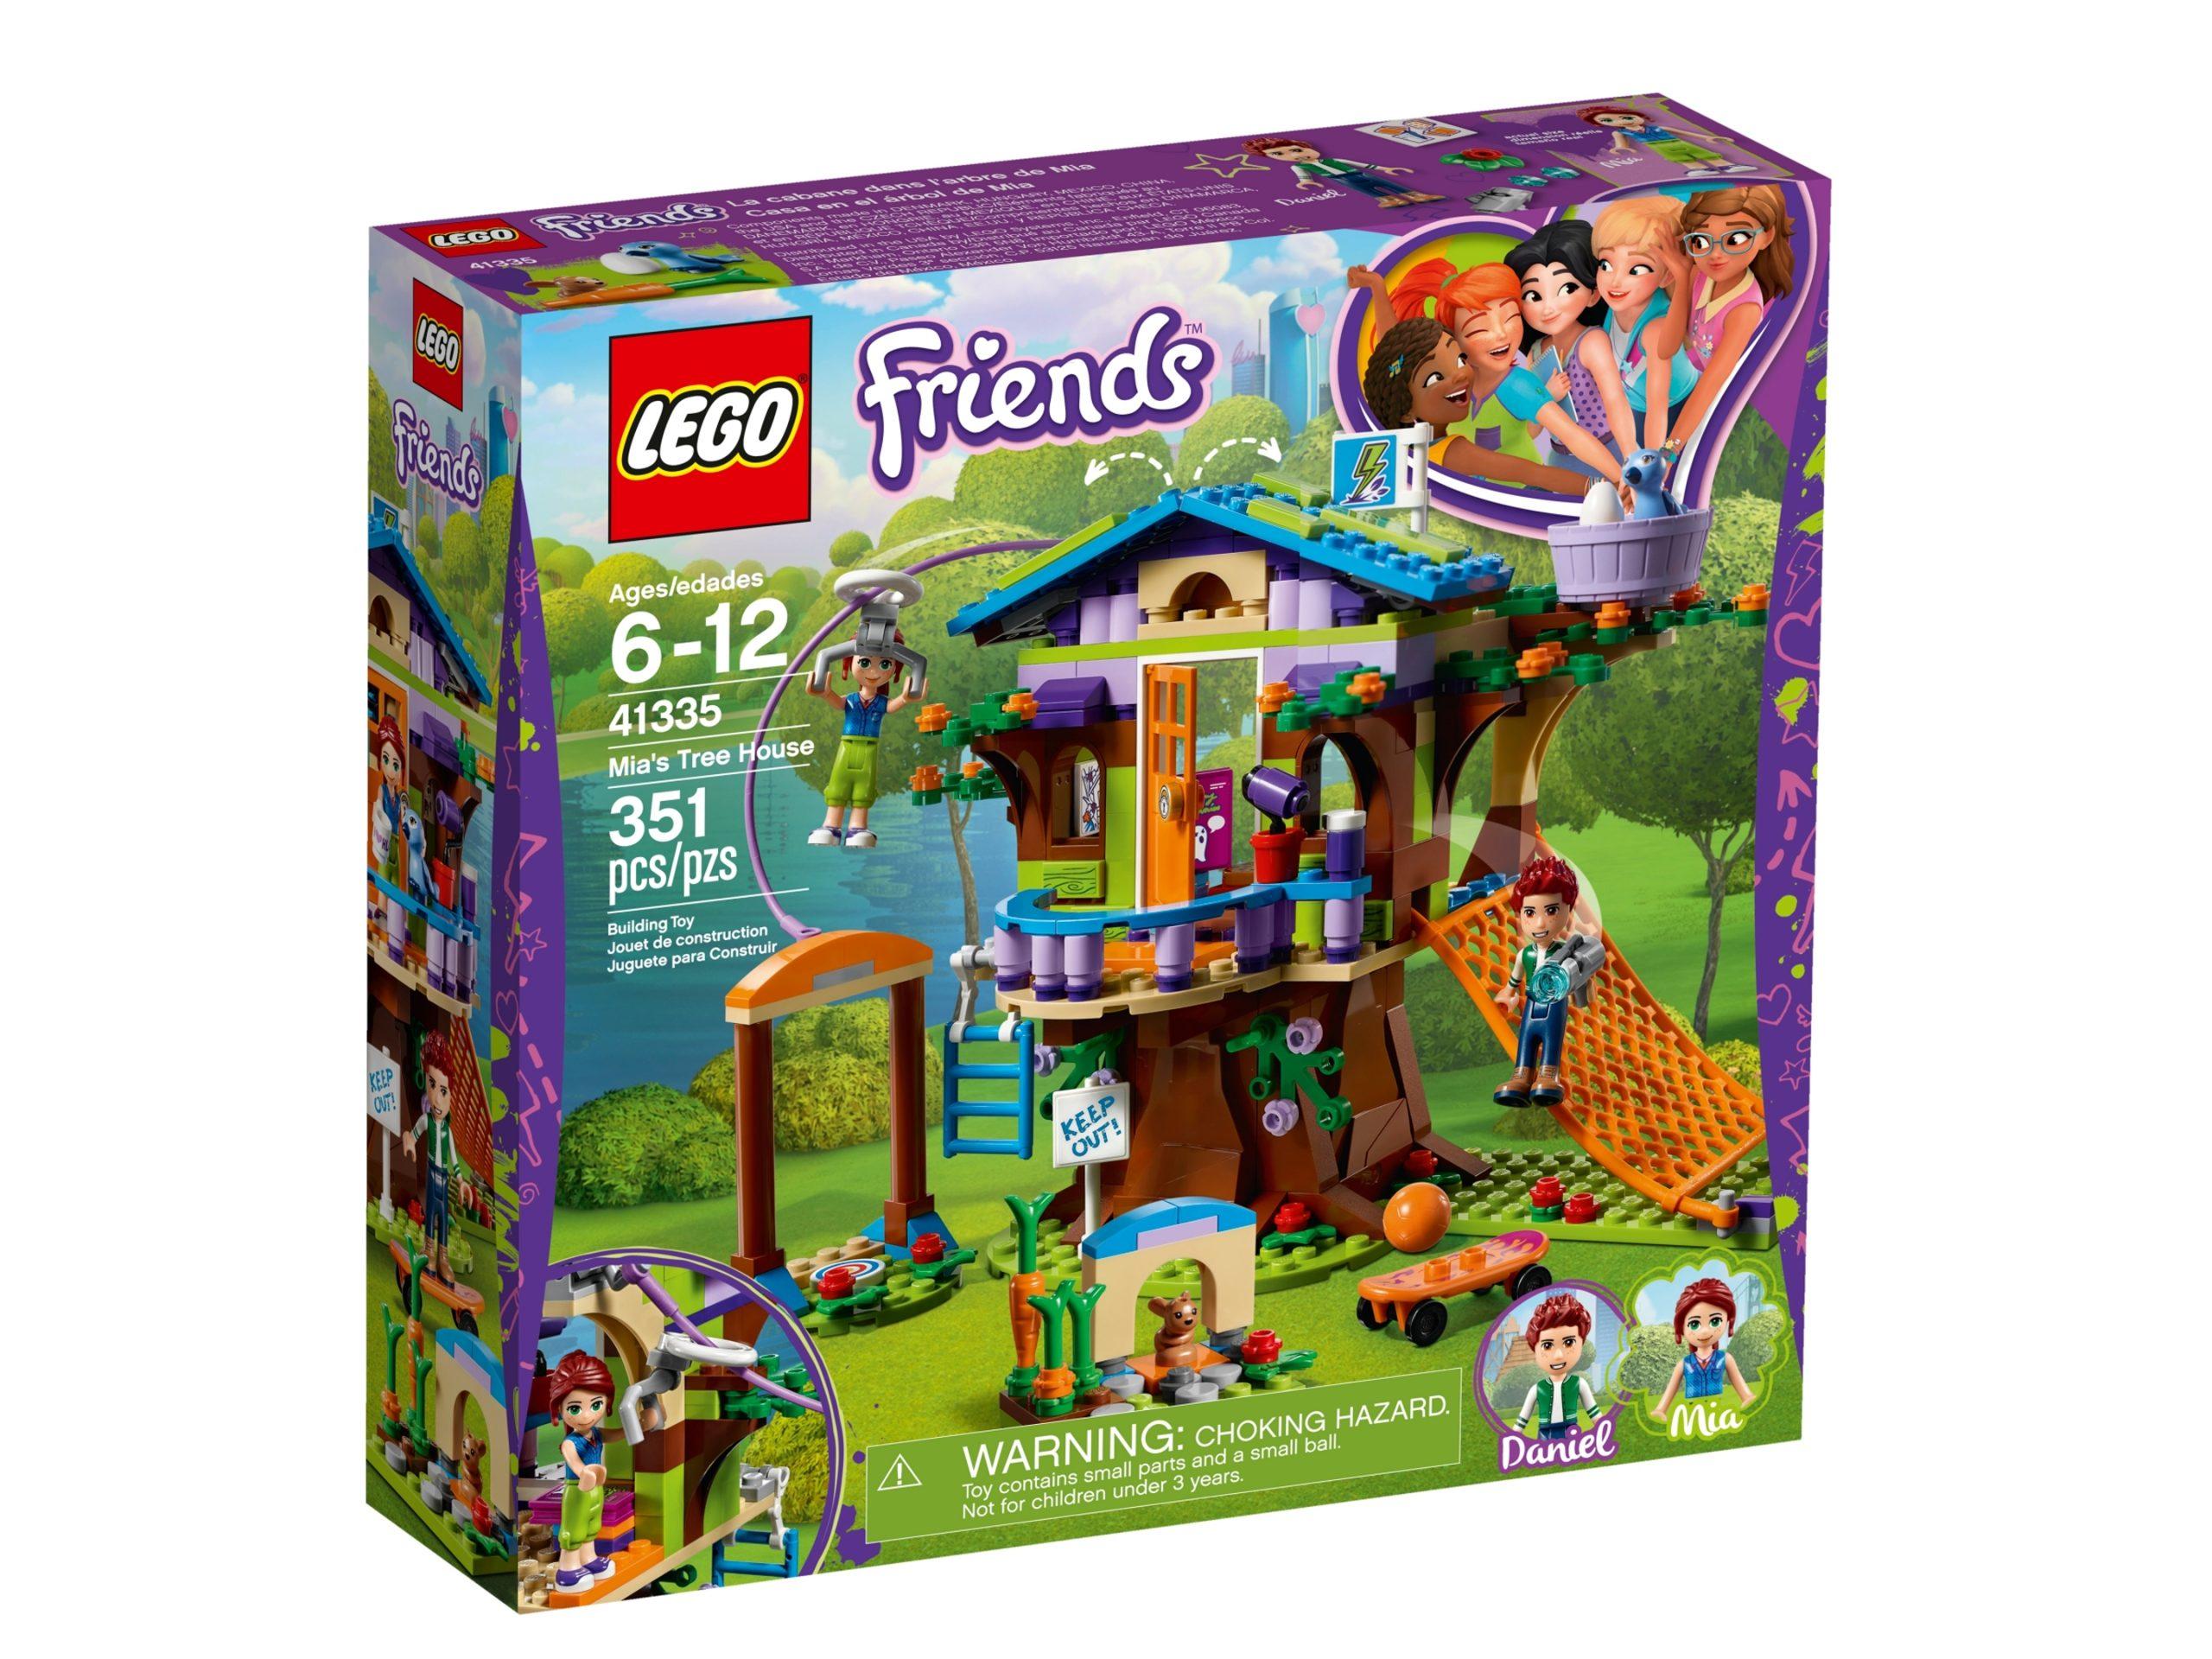 LEGO 41335 sale - Mia's Tree House - $ 29.99 lowest price